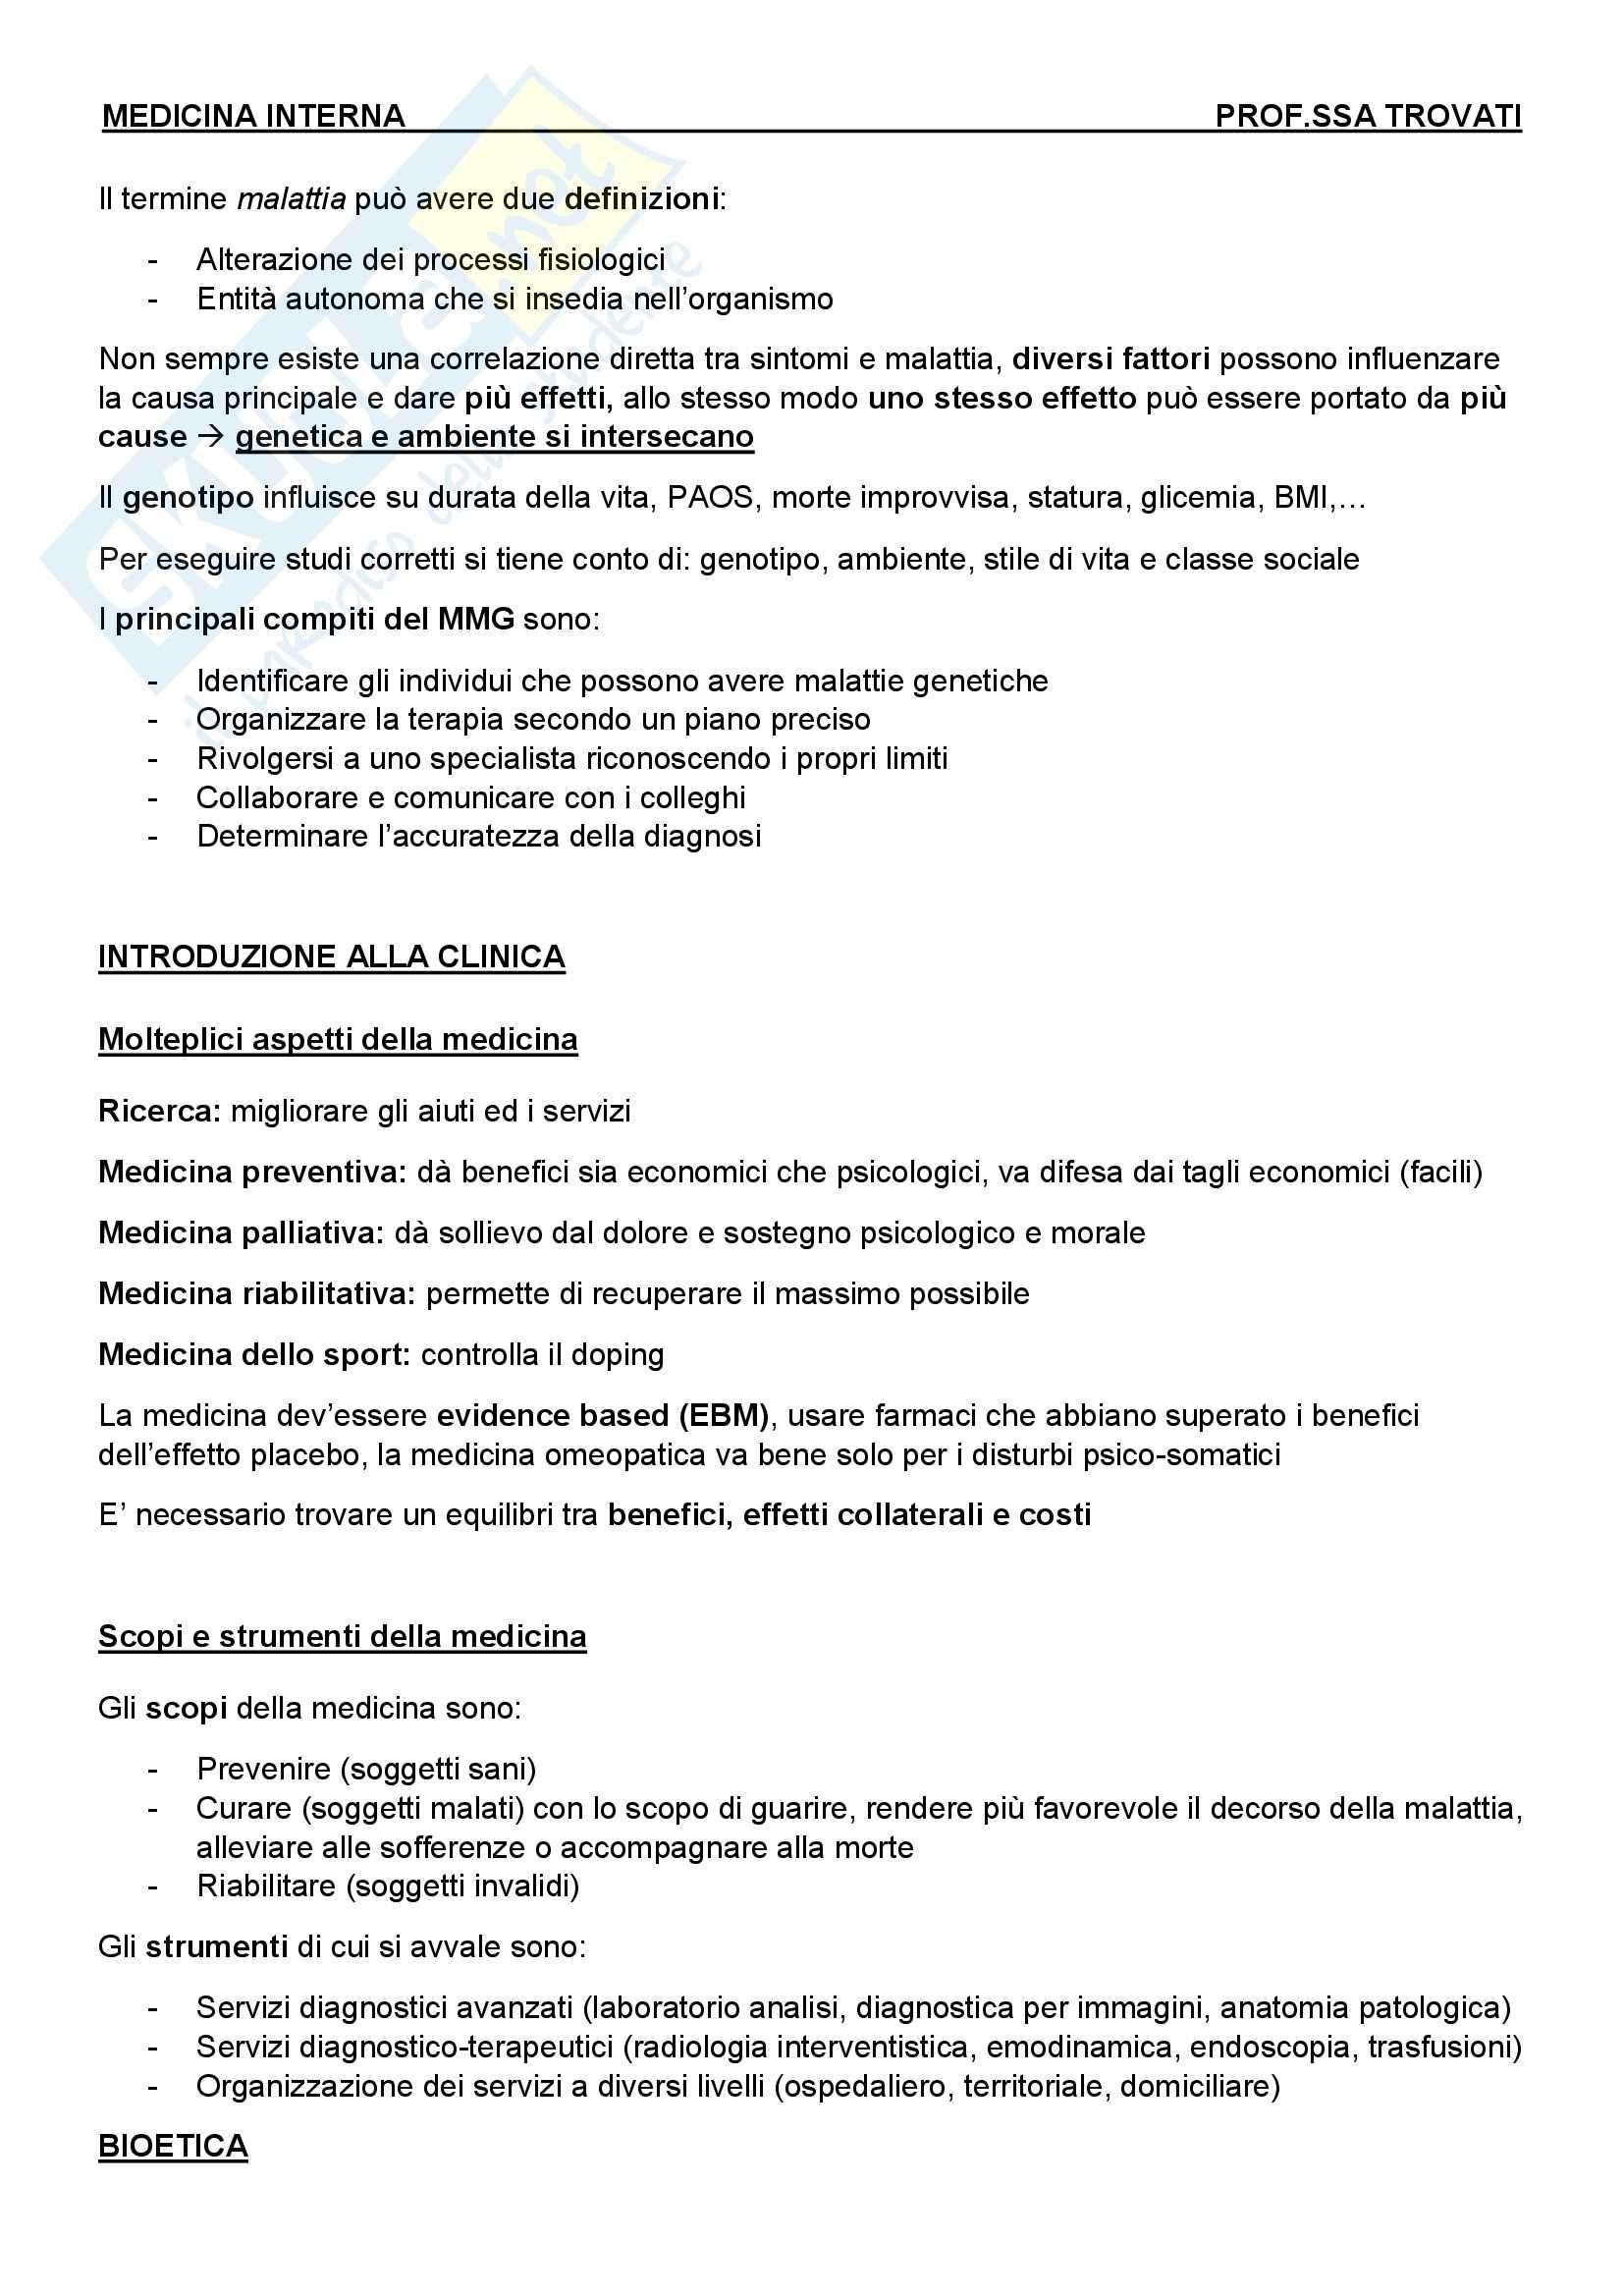 Introduzione alla medicina - Appunti